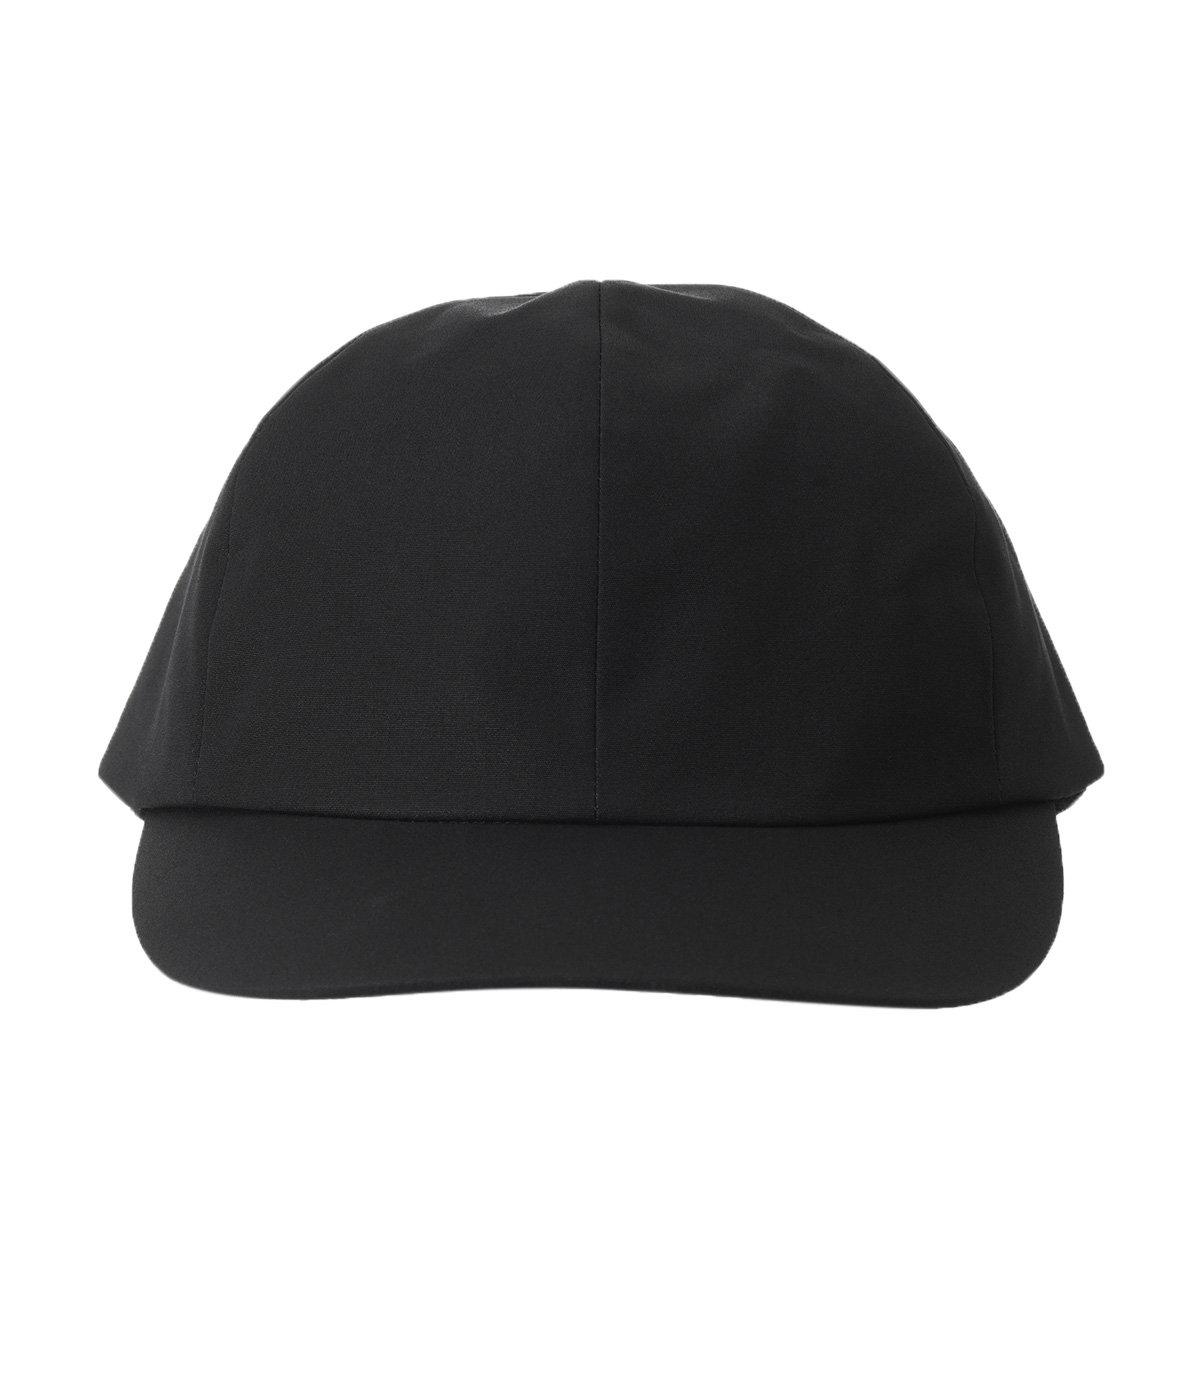 【予約】VENTILE LITTLE BRIM CAP